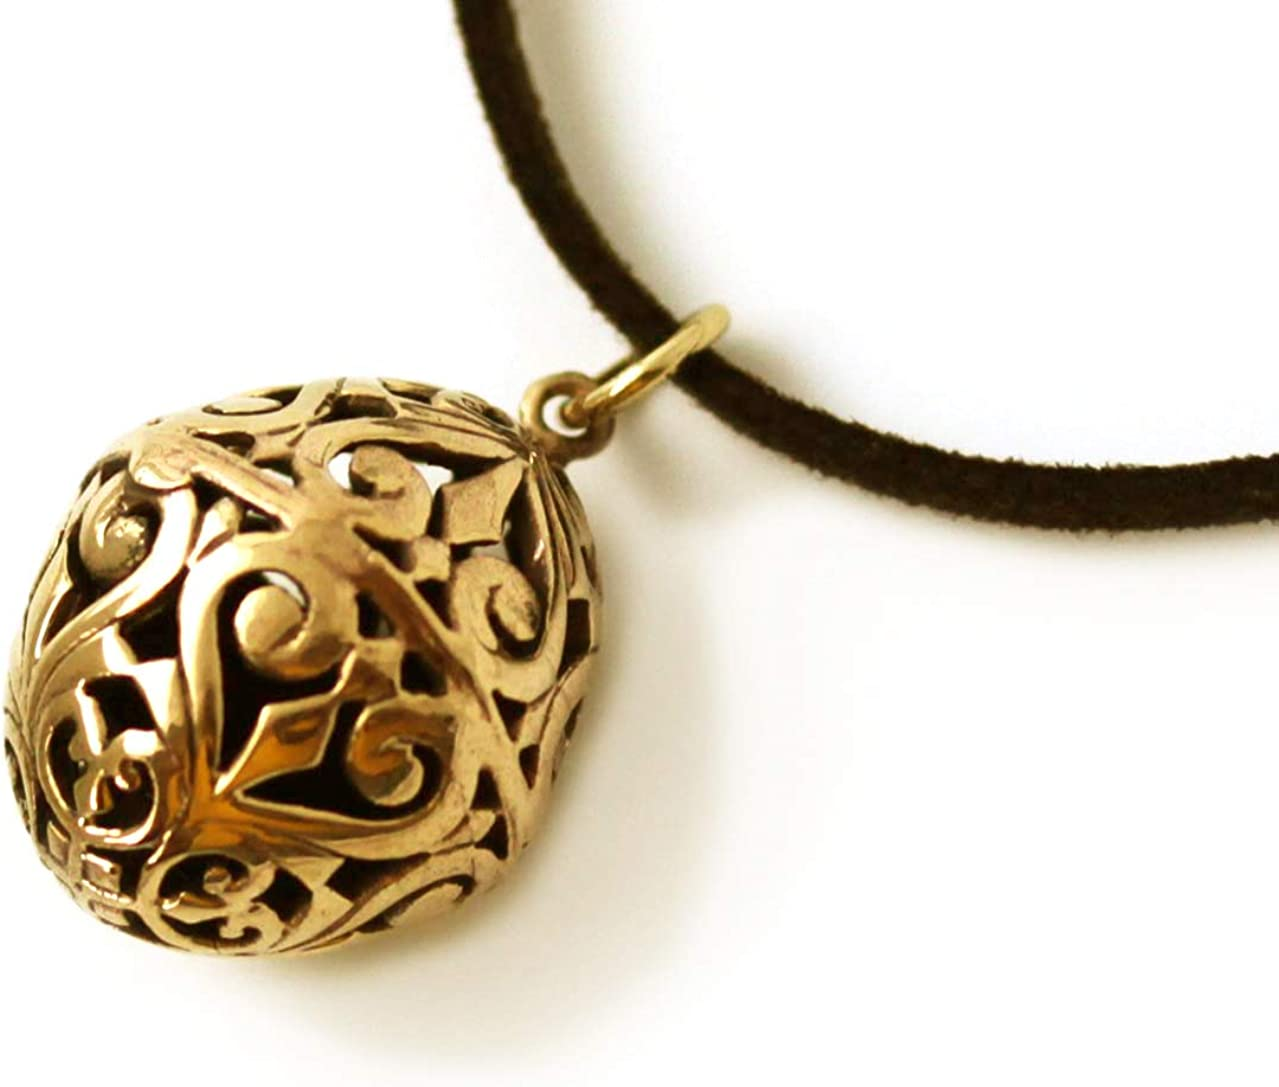 Glitzs Jewels 925 Sterling Silver Pendant for Necklace Fleur de lis Cute Gift for Women